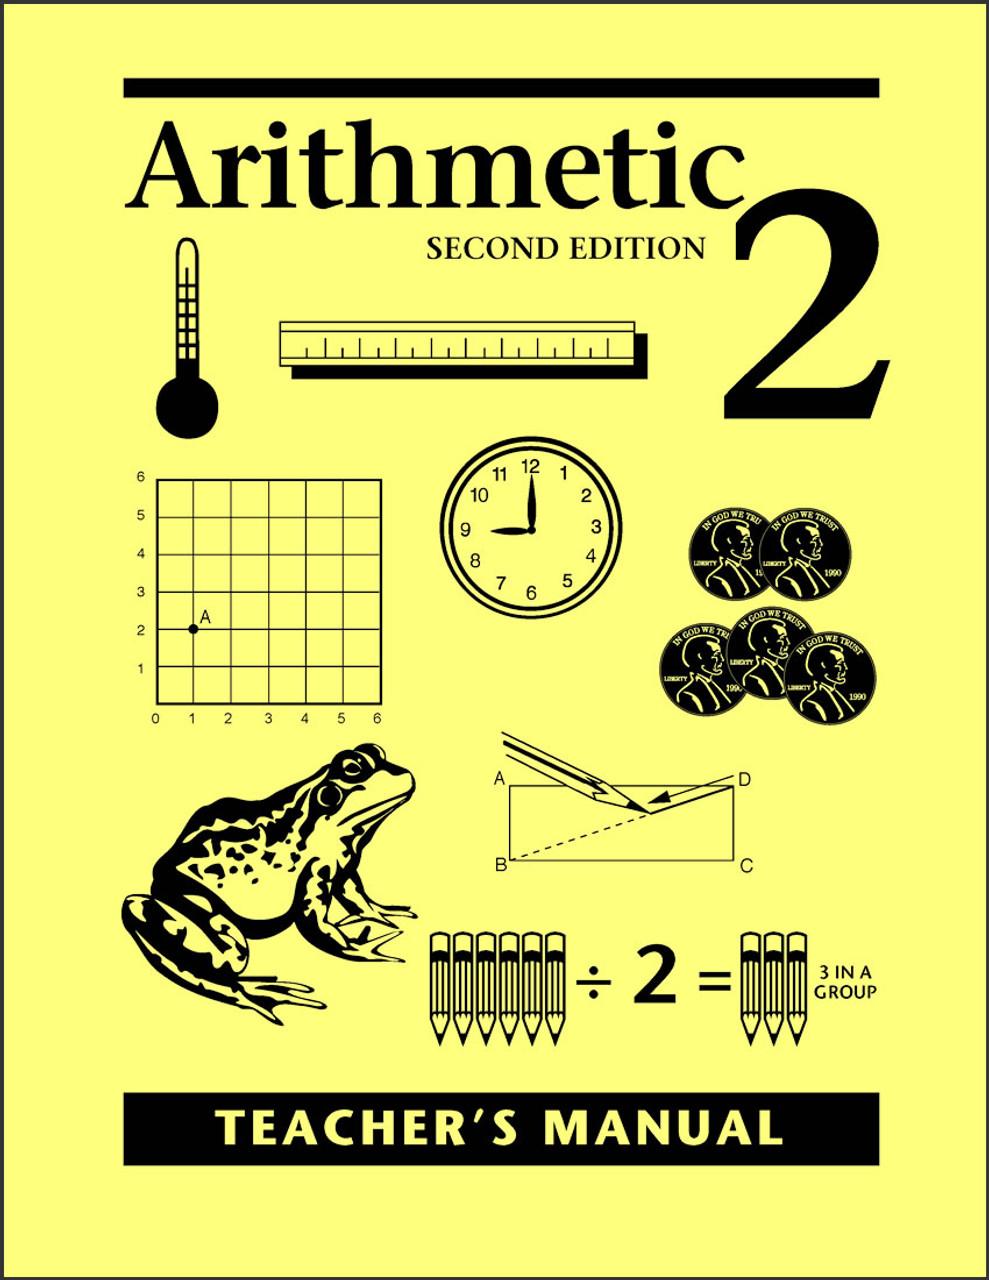 Arithmetic 2, 2nd edition - Teacher's Manual